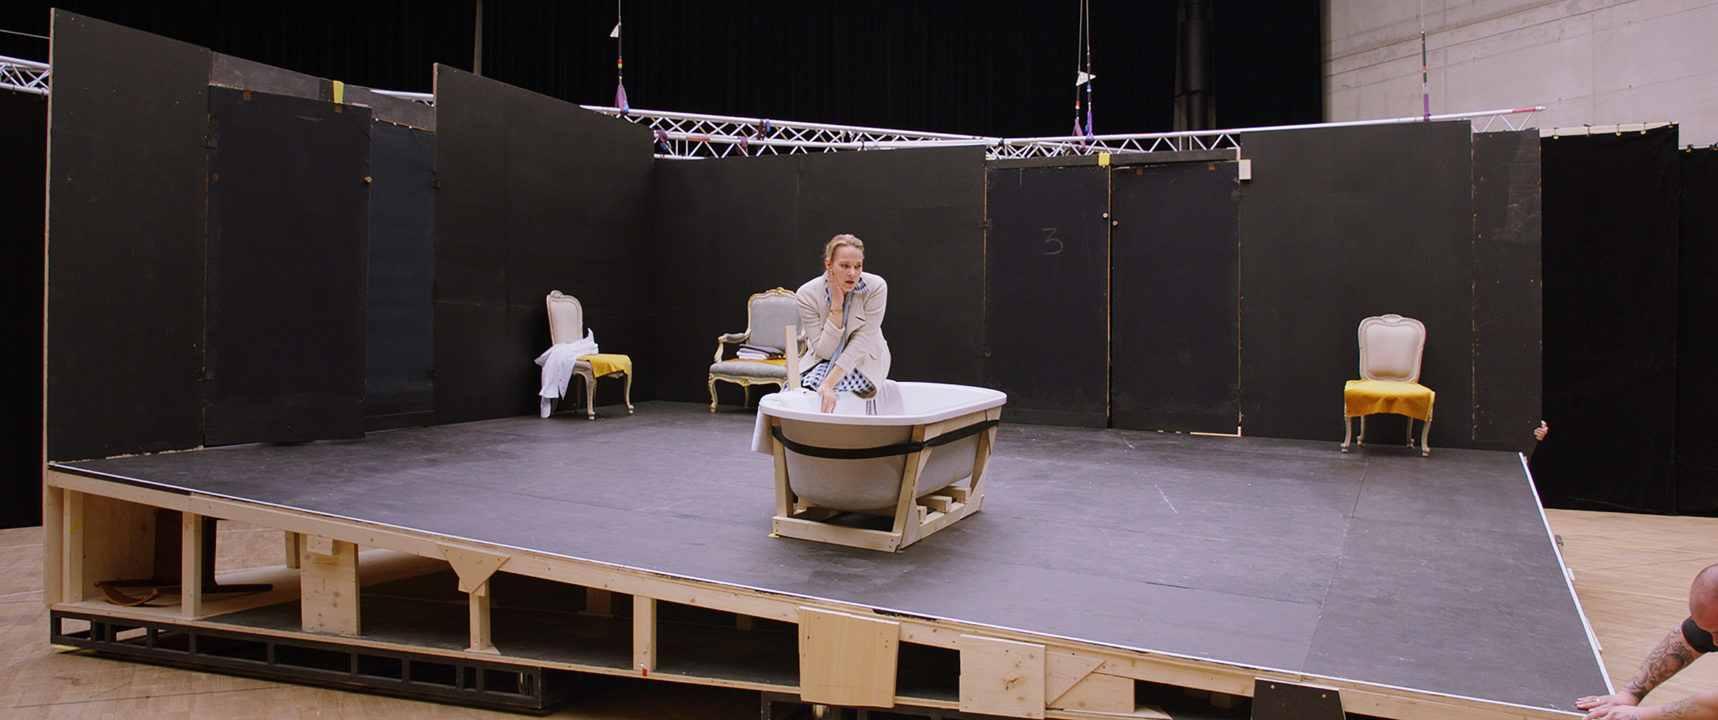 Backstage Wiener Staatsoper